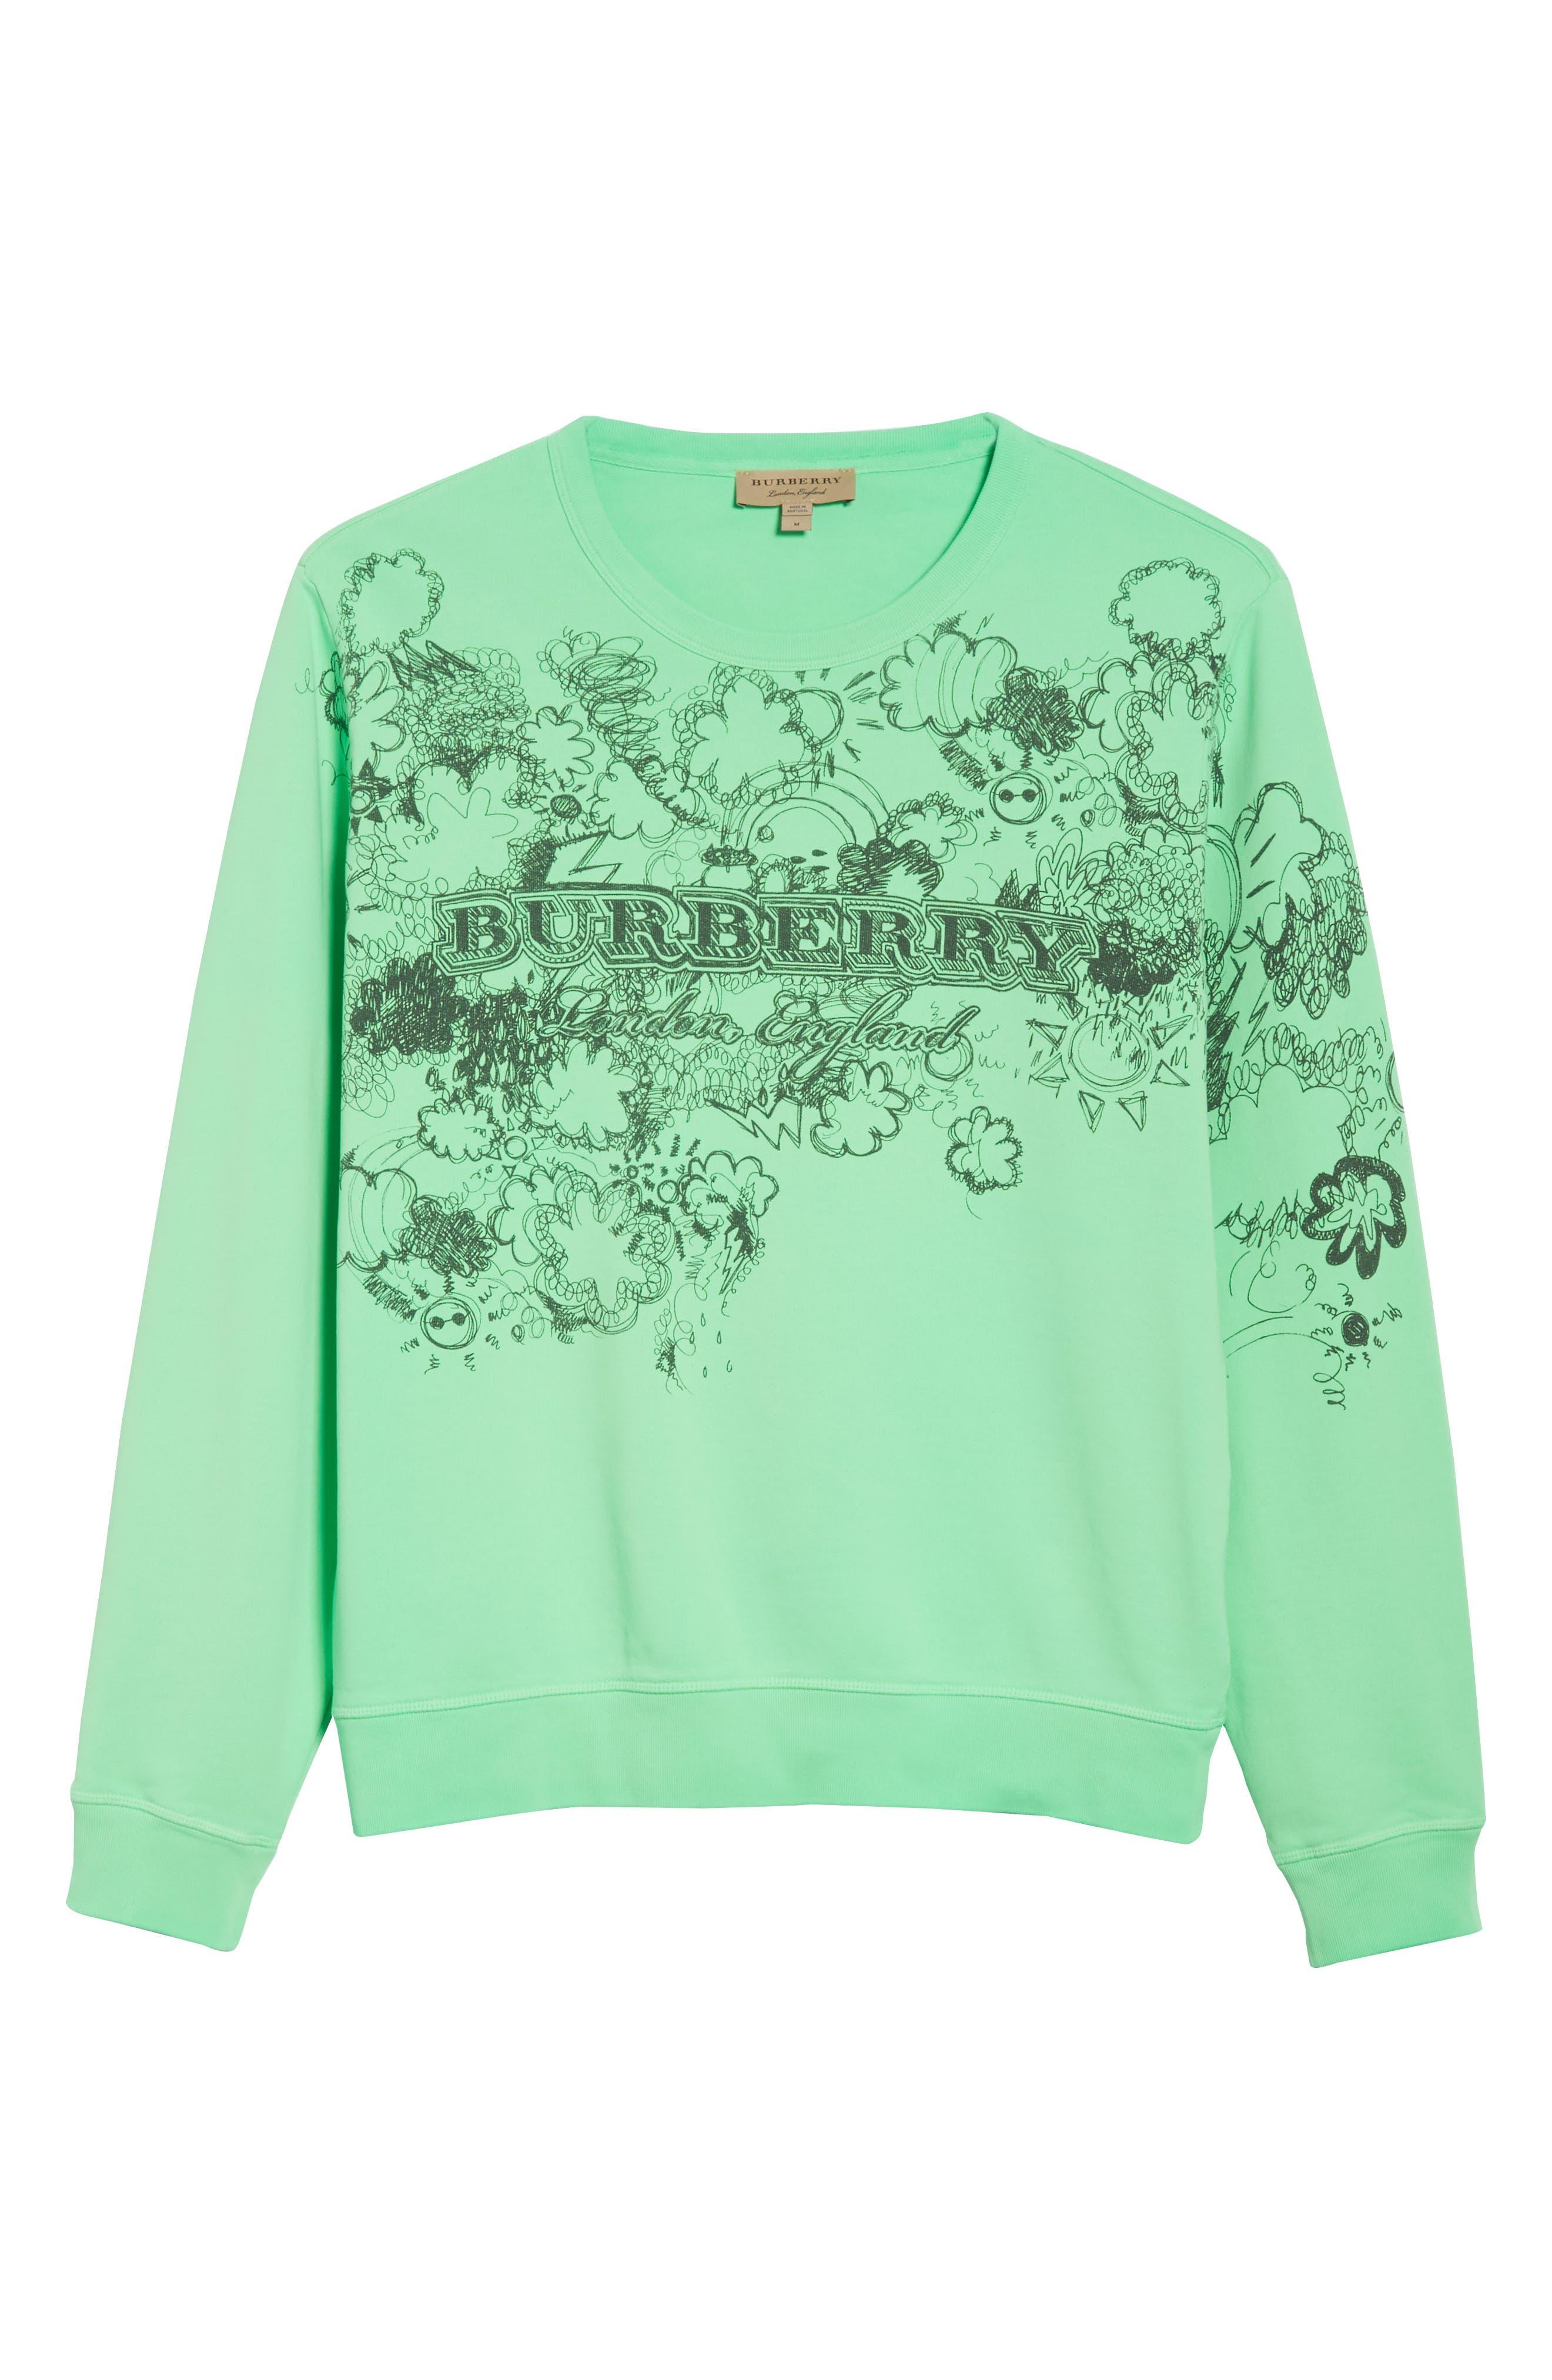 Madon Graphic Sweatshirt,                             Alternate thumbnail 6, color,                             300